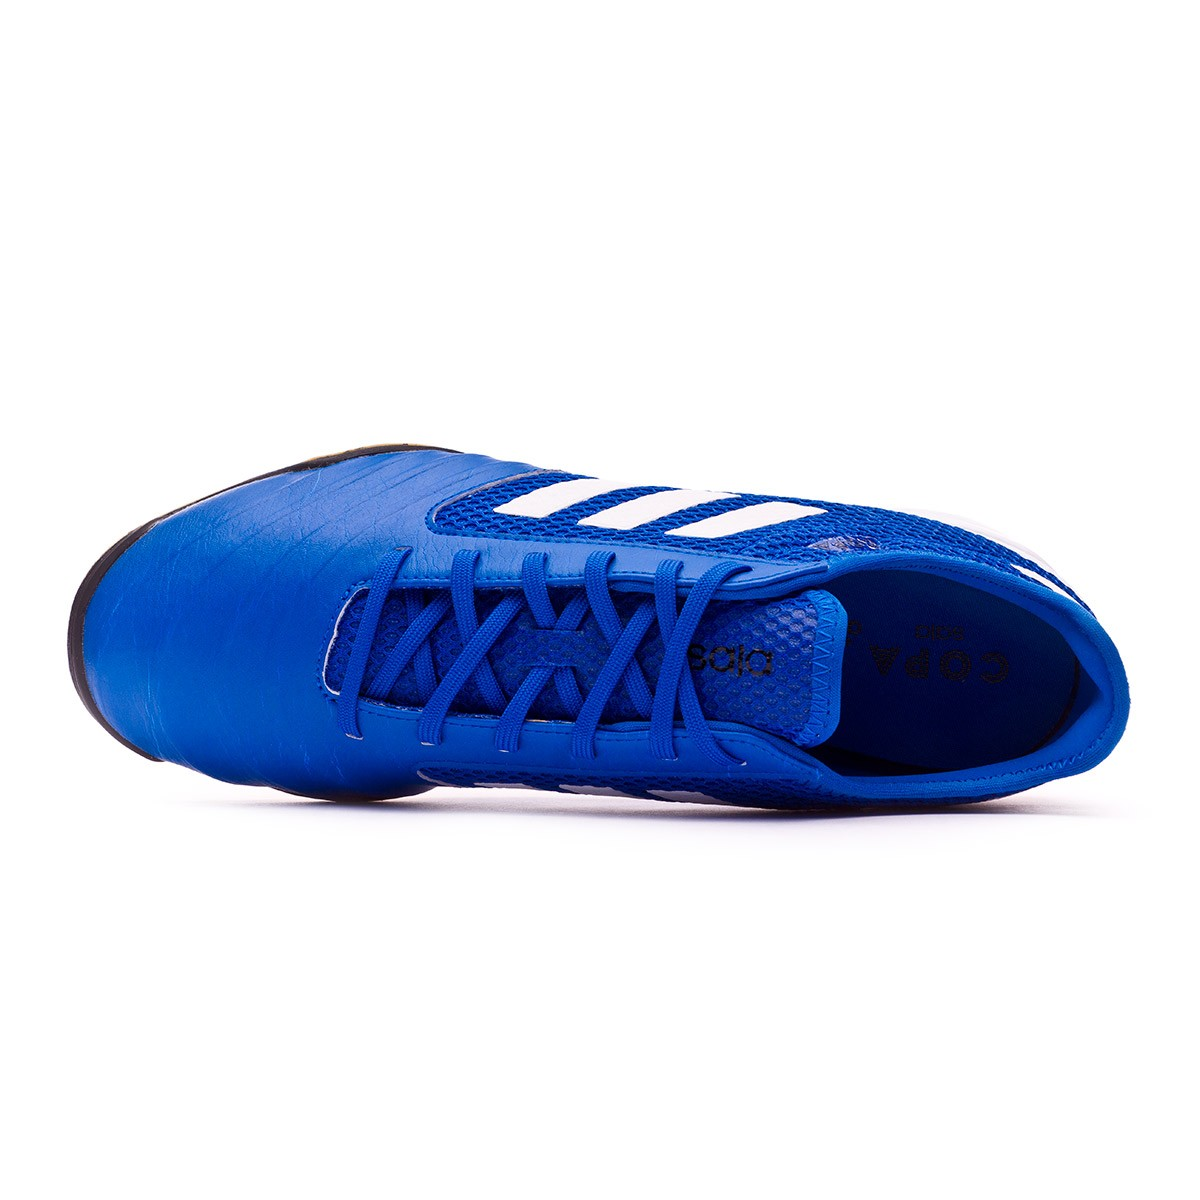 4d6d76bad1d Futsal Boot adidas Copa Tango 18.3 TopSala Football blue-White - Football  store Fútbol Emotion